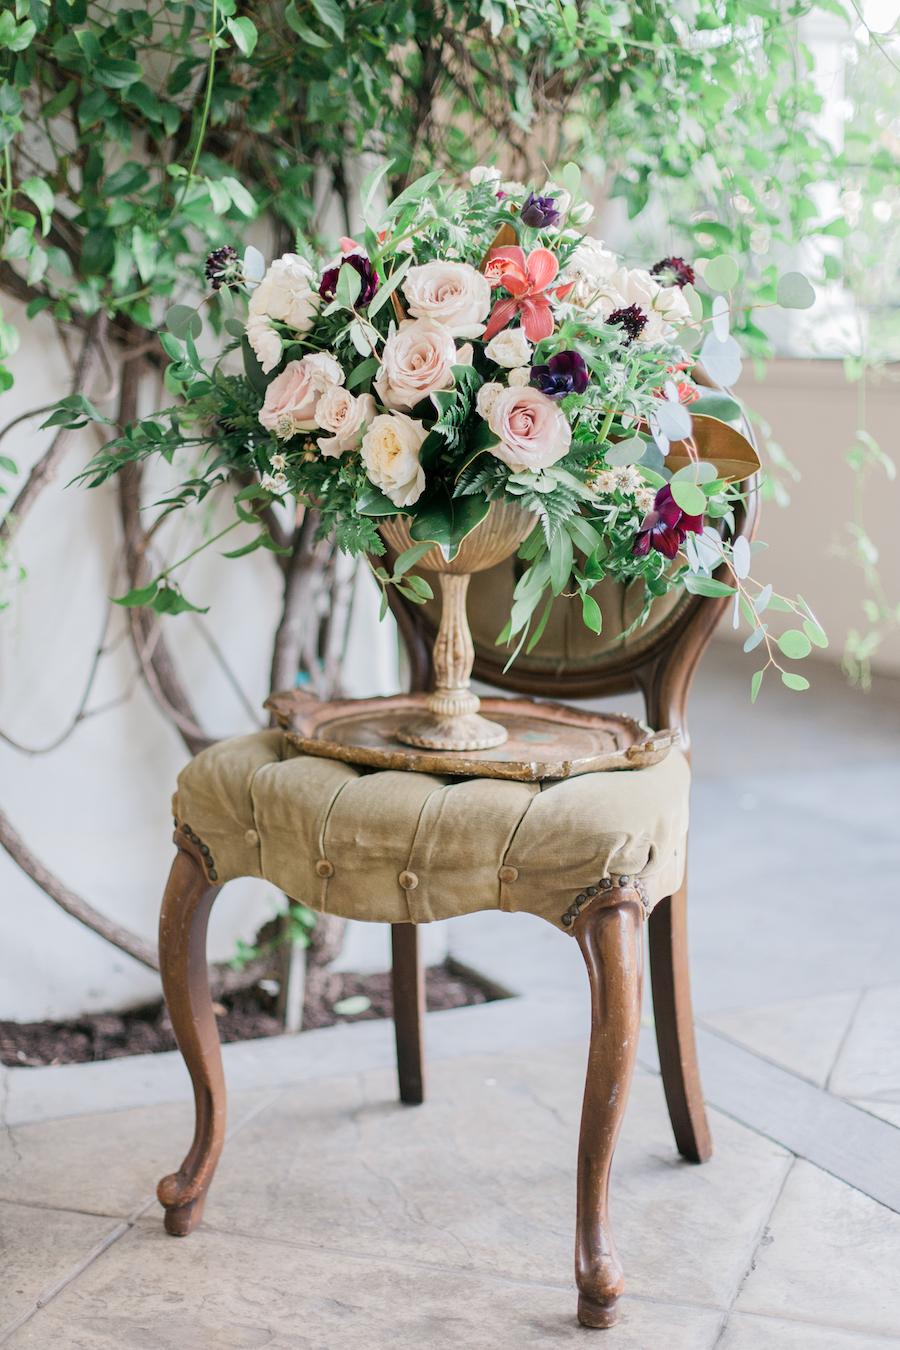 burlap-and-bordeux-steven-leyva-photography-villa-and-vine-wedding-styled-shoot3.jpg